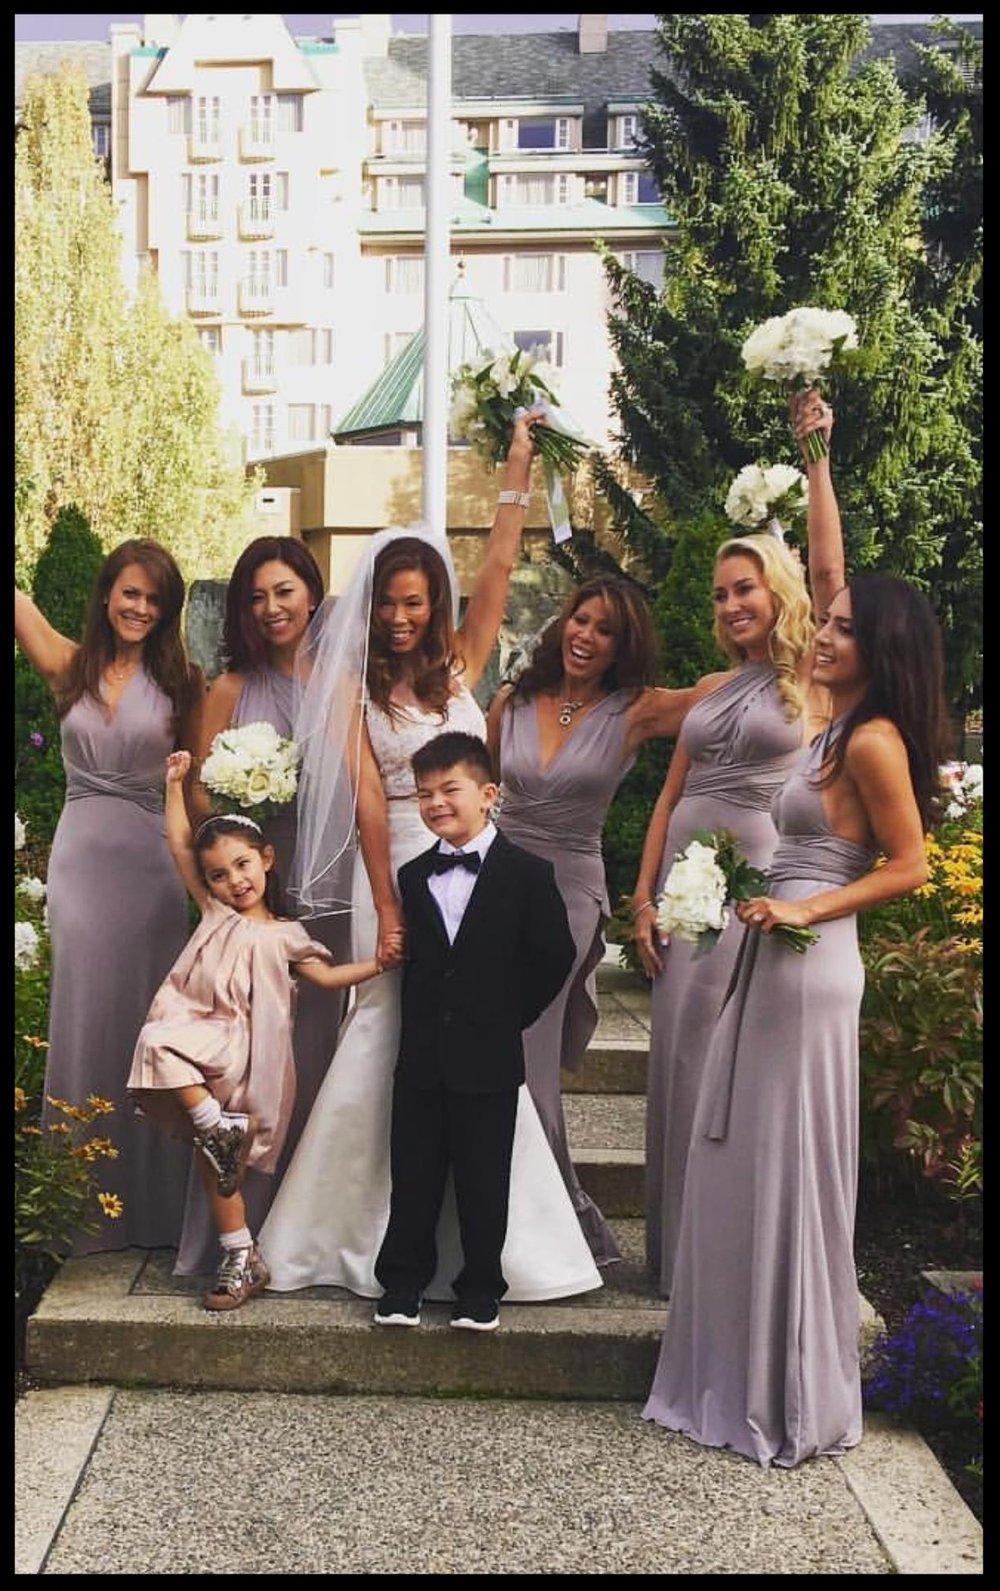 DL Wedding Girls 09.02.16.jpg